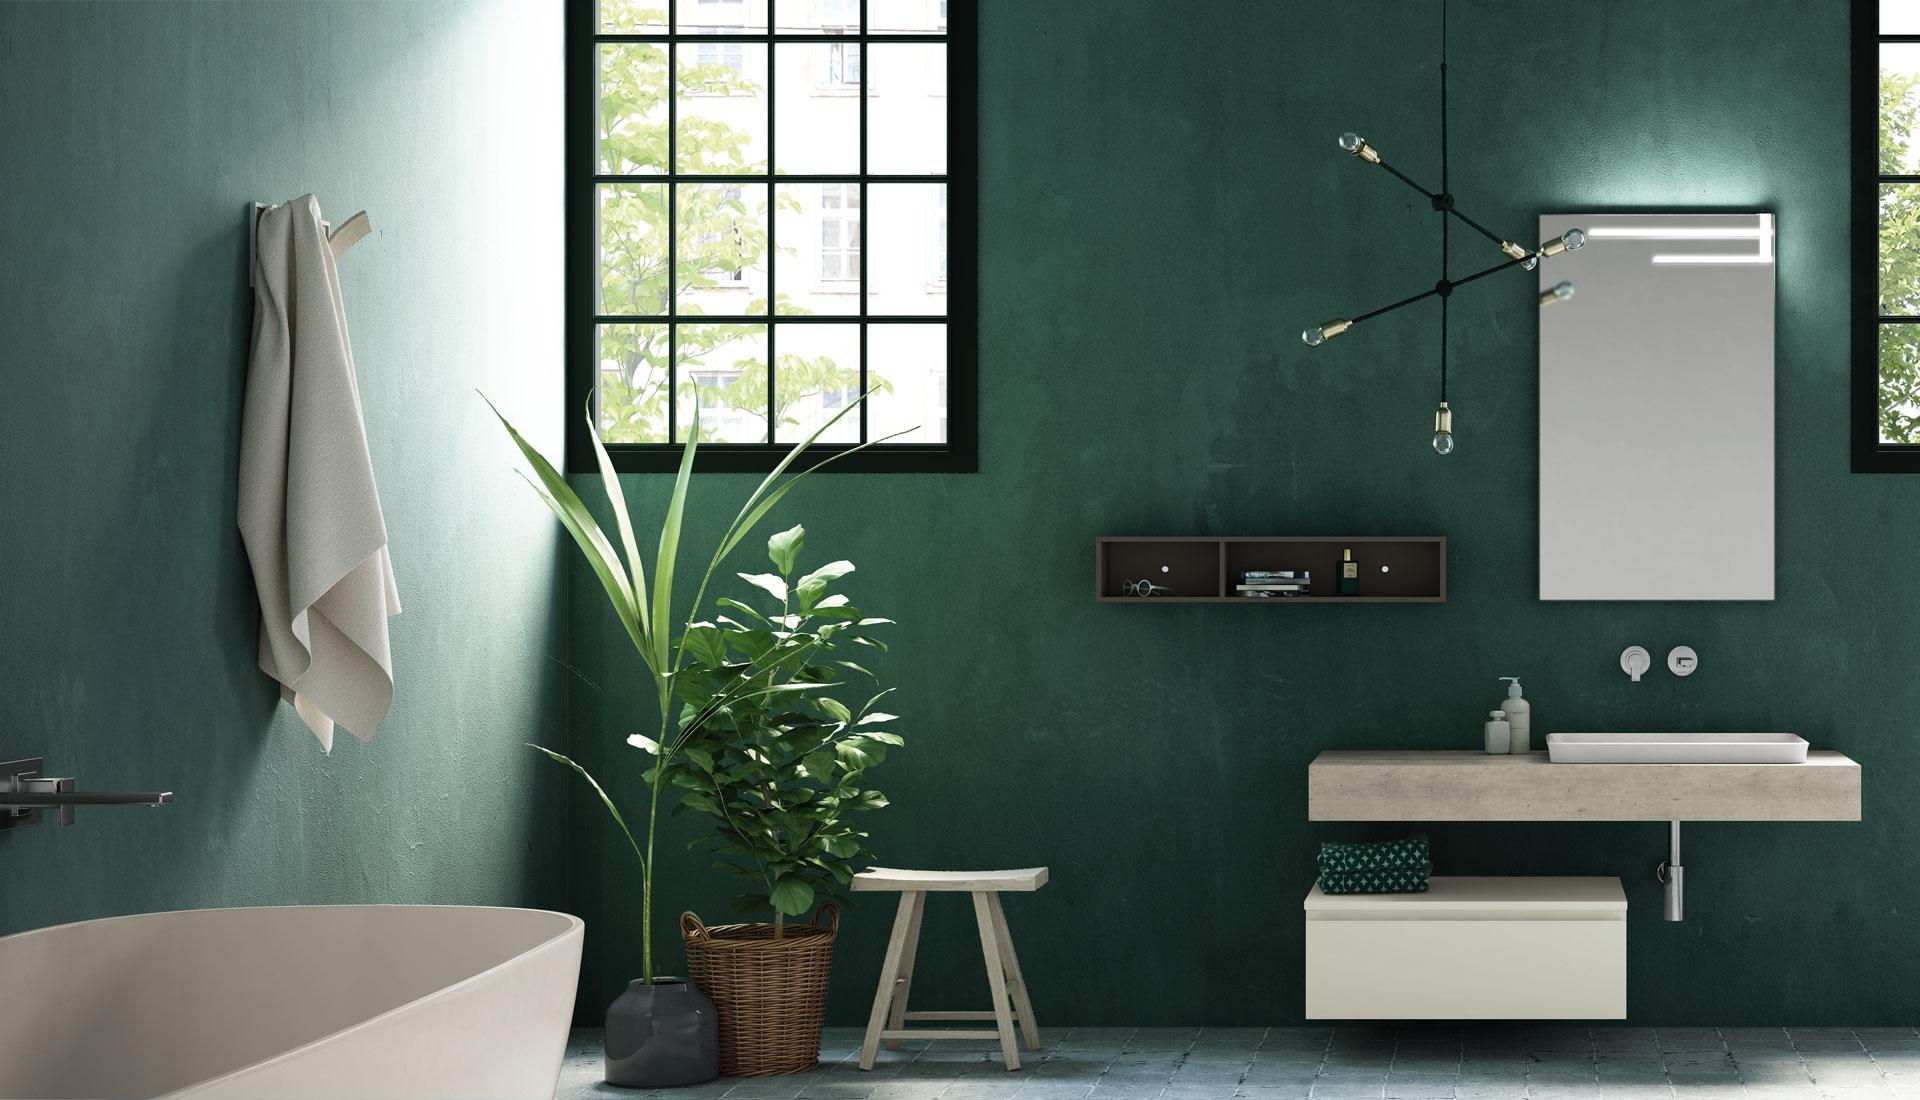 arredobagno gola nw1 generale - Идеи и советы для ремонта в ванной комнате